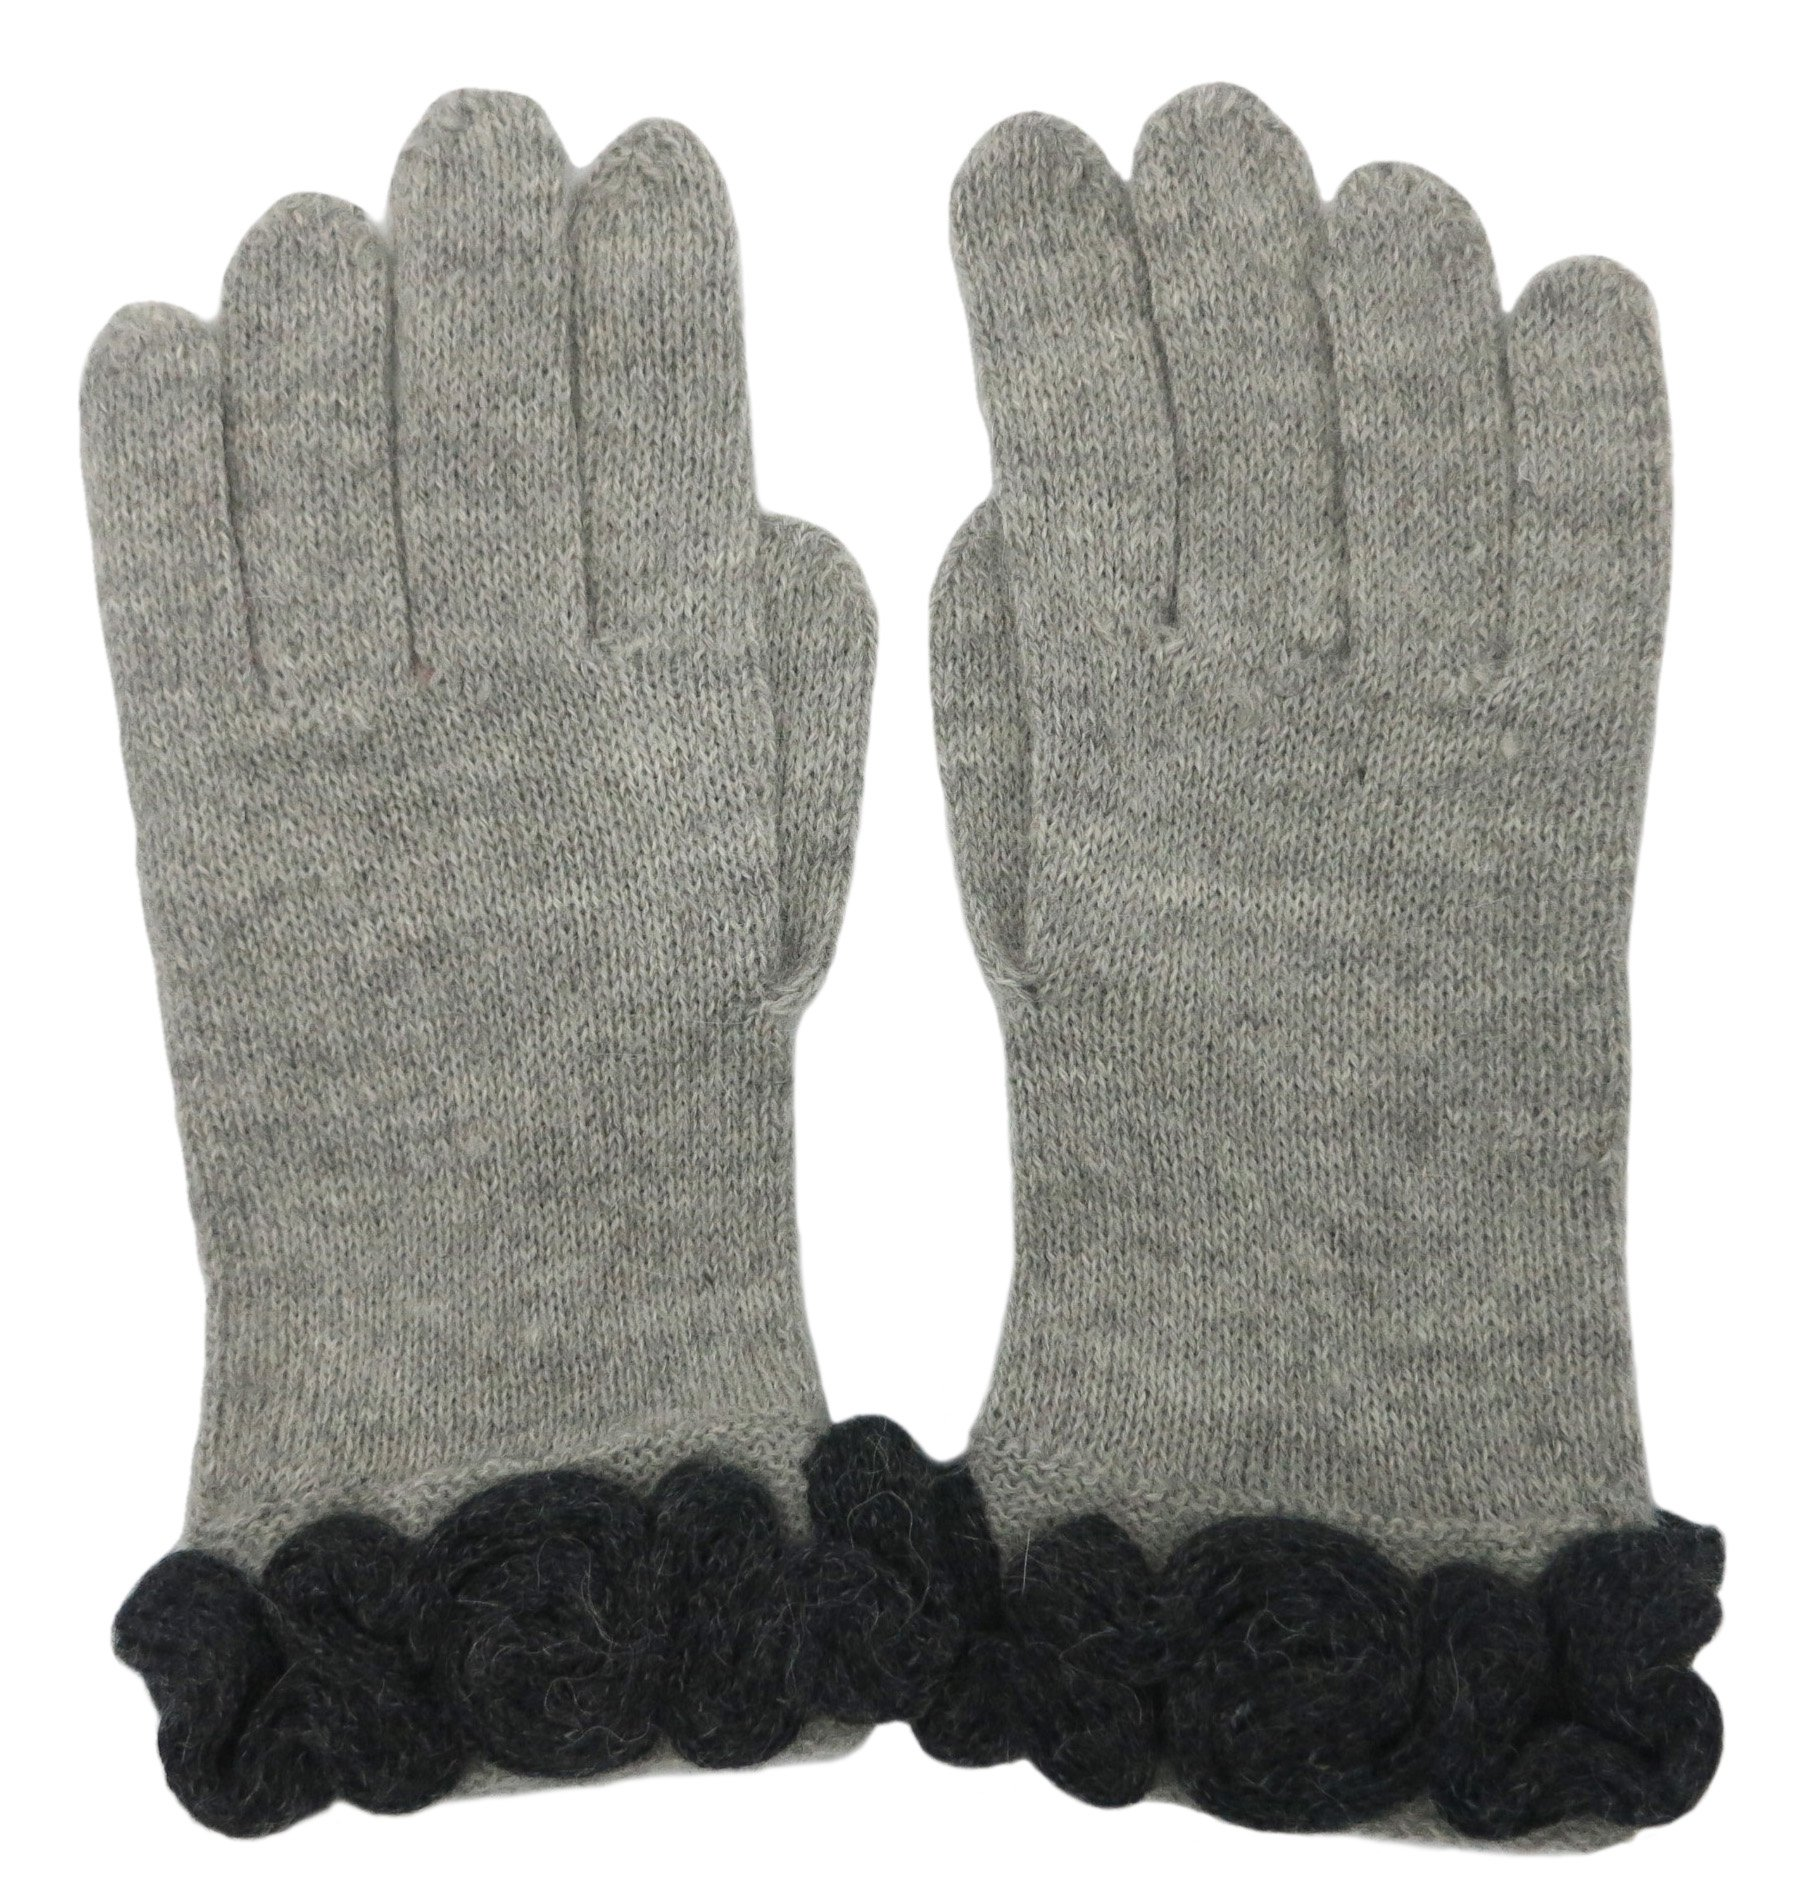 Handmade PURE ALPACA Luxurious Gloves - Designer Gray (Ready to Ship)